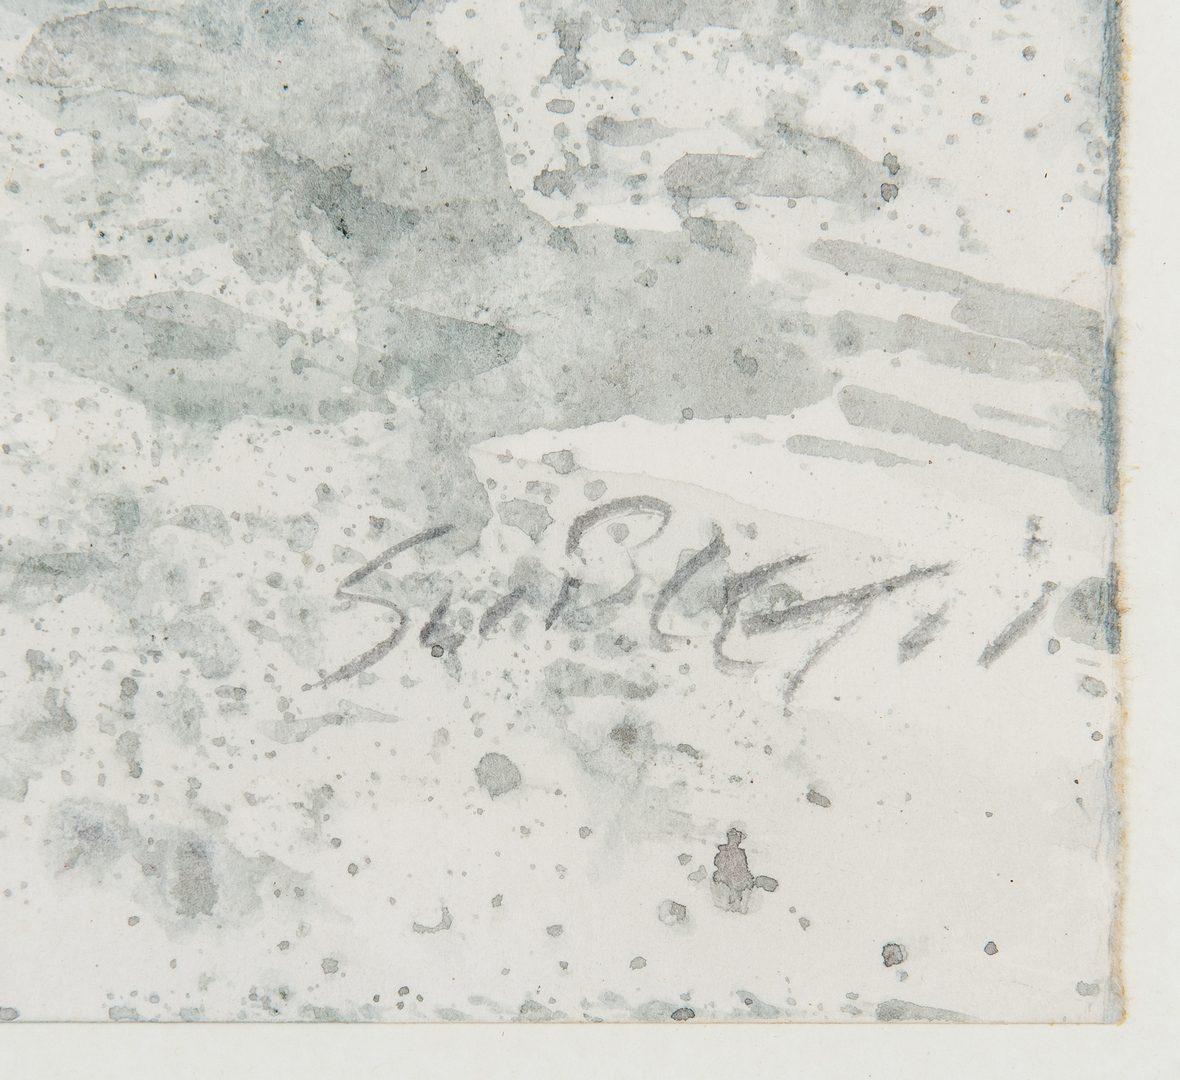 Lot 88: Carl Sublett, Watercolor Winter Scene